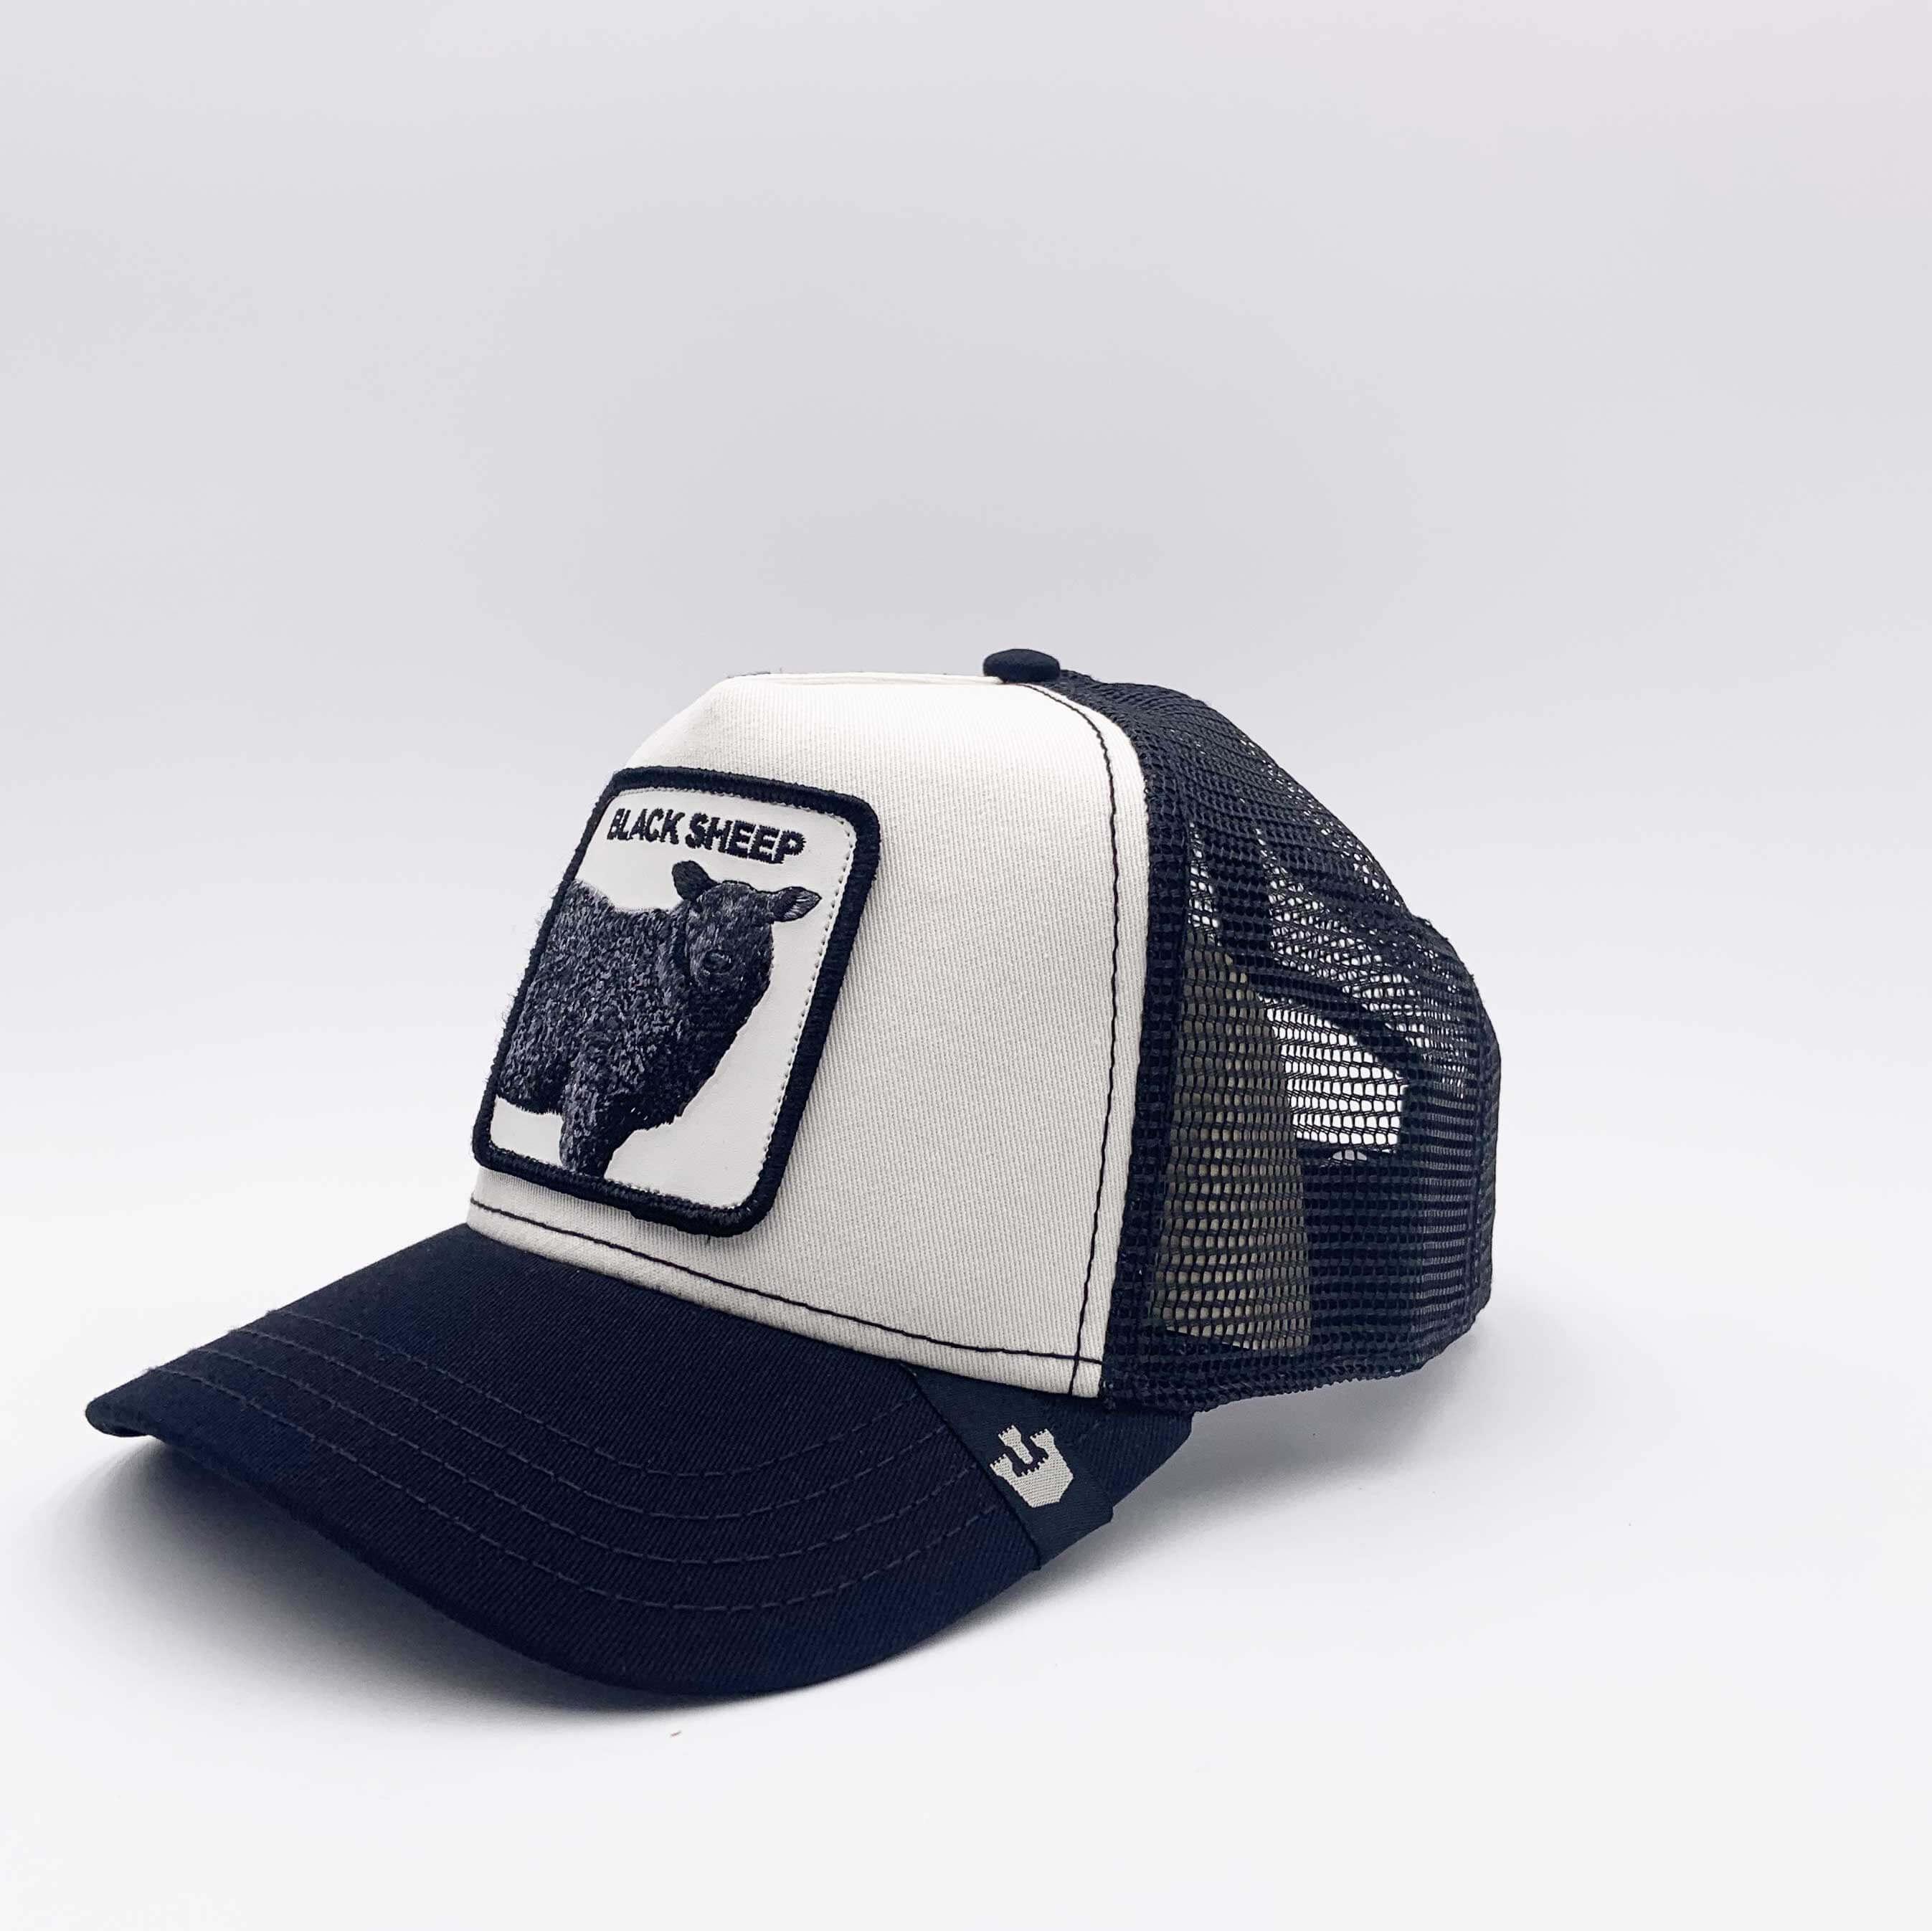 Cappello black sheep - Bianco